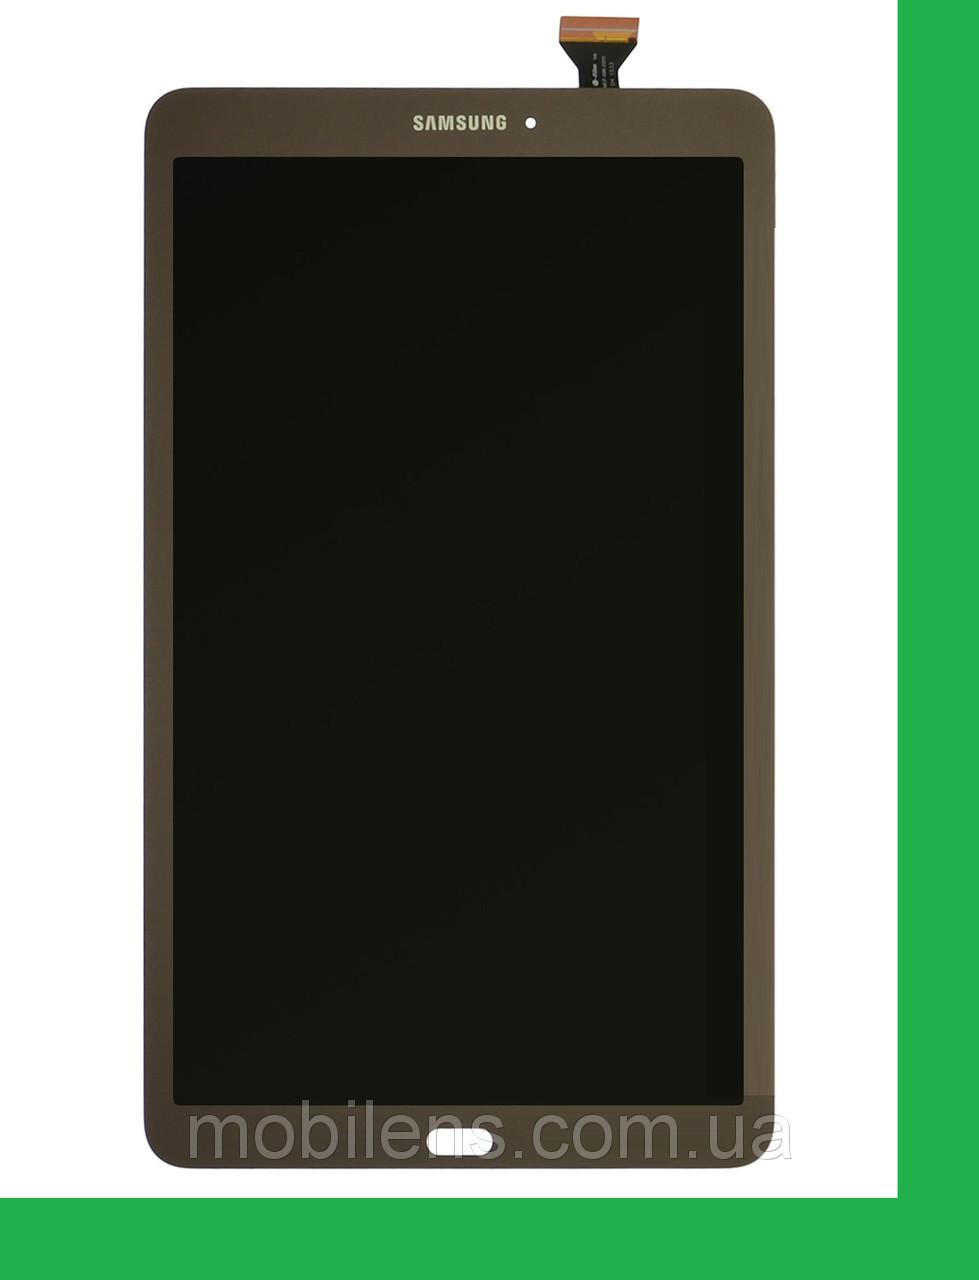 Samsung T560, T561, Galaxy Tab E 9.6 Дисплей+тачскрин(сенсор) коричневый (бронзовый)